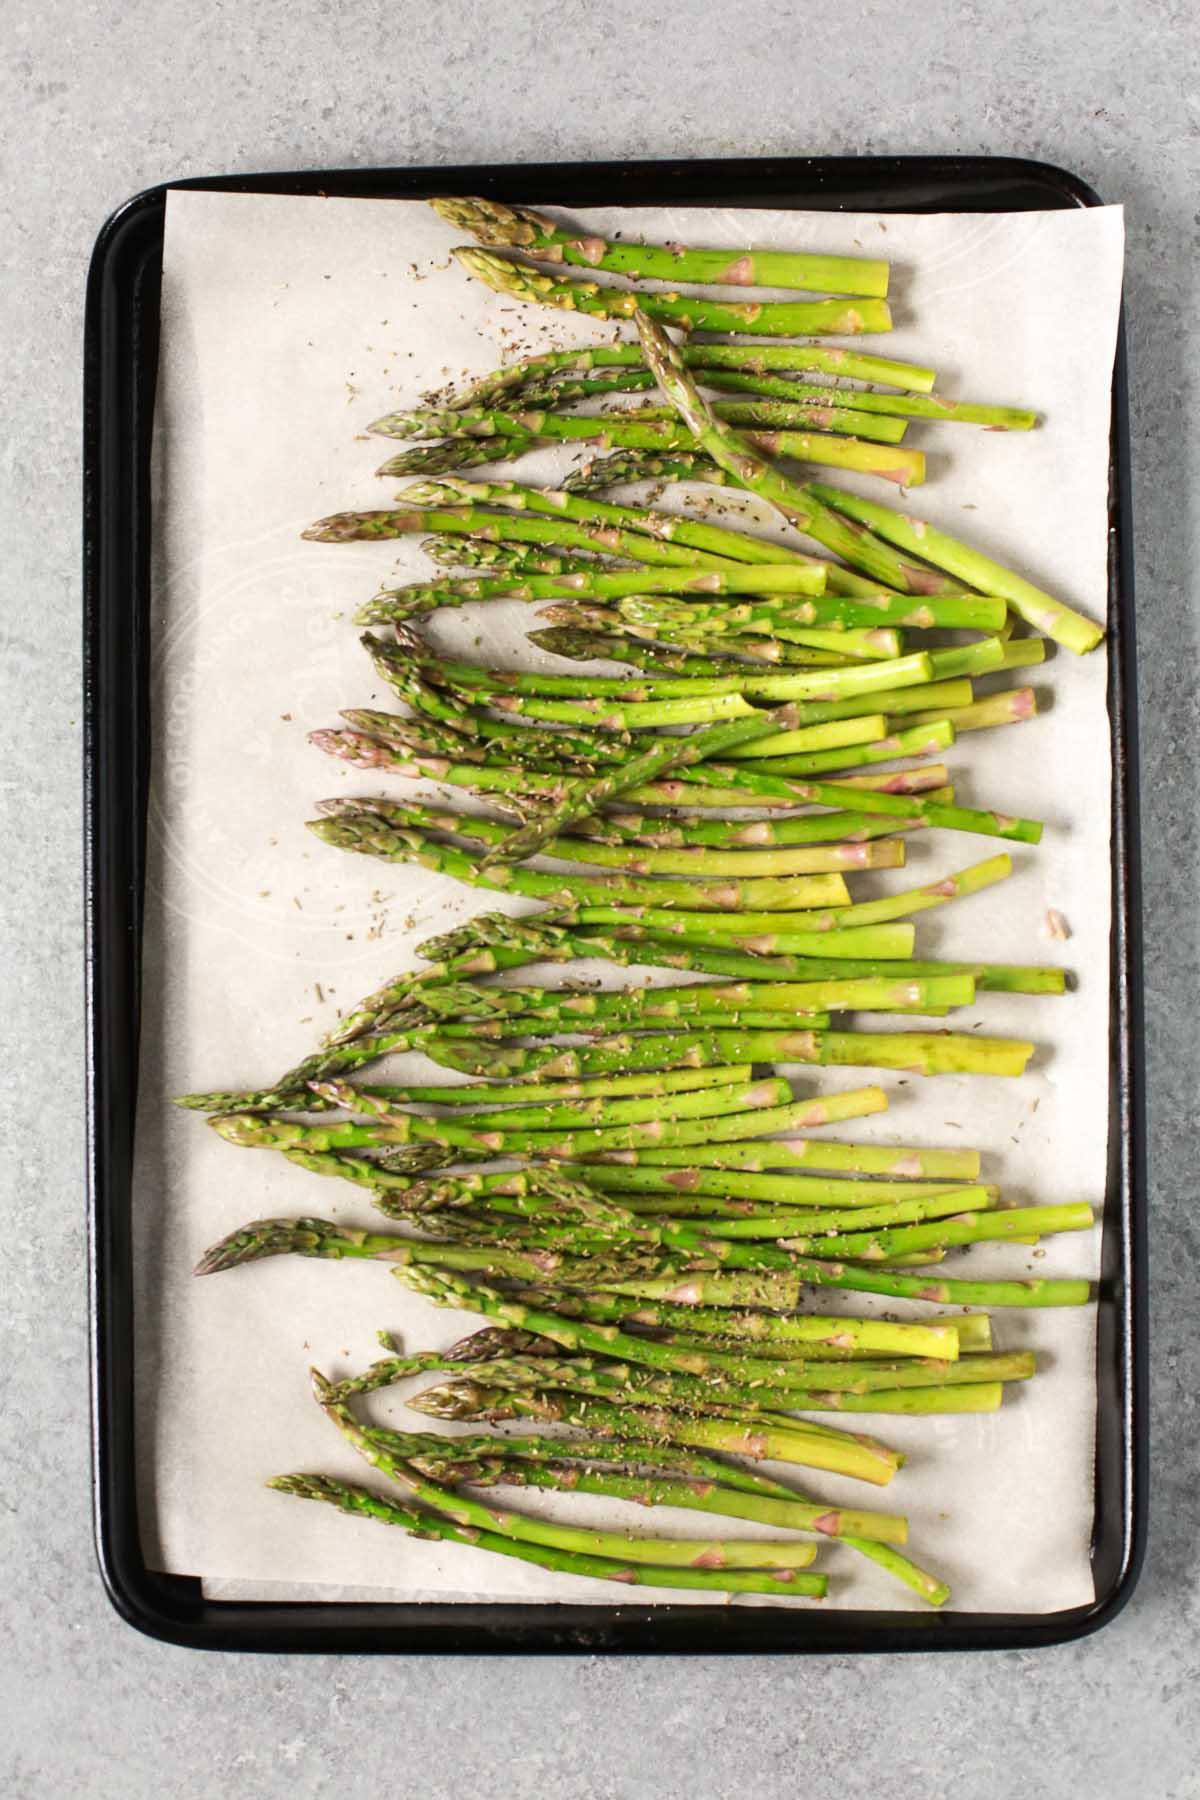 Seasoning asparagus on a sheet pan before roasting.